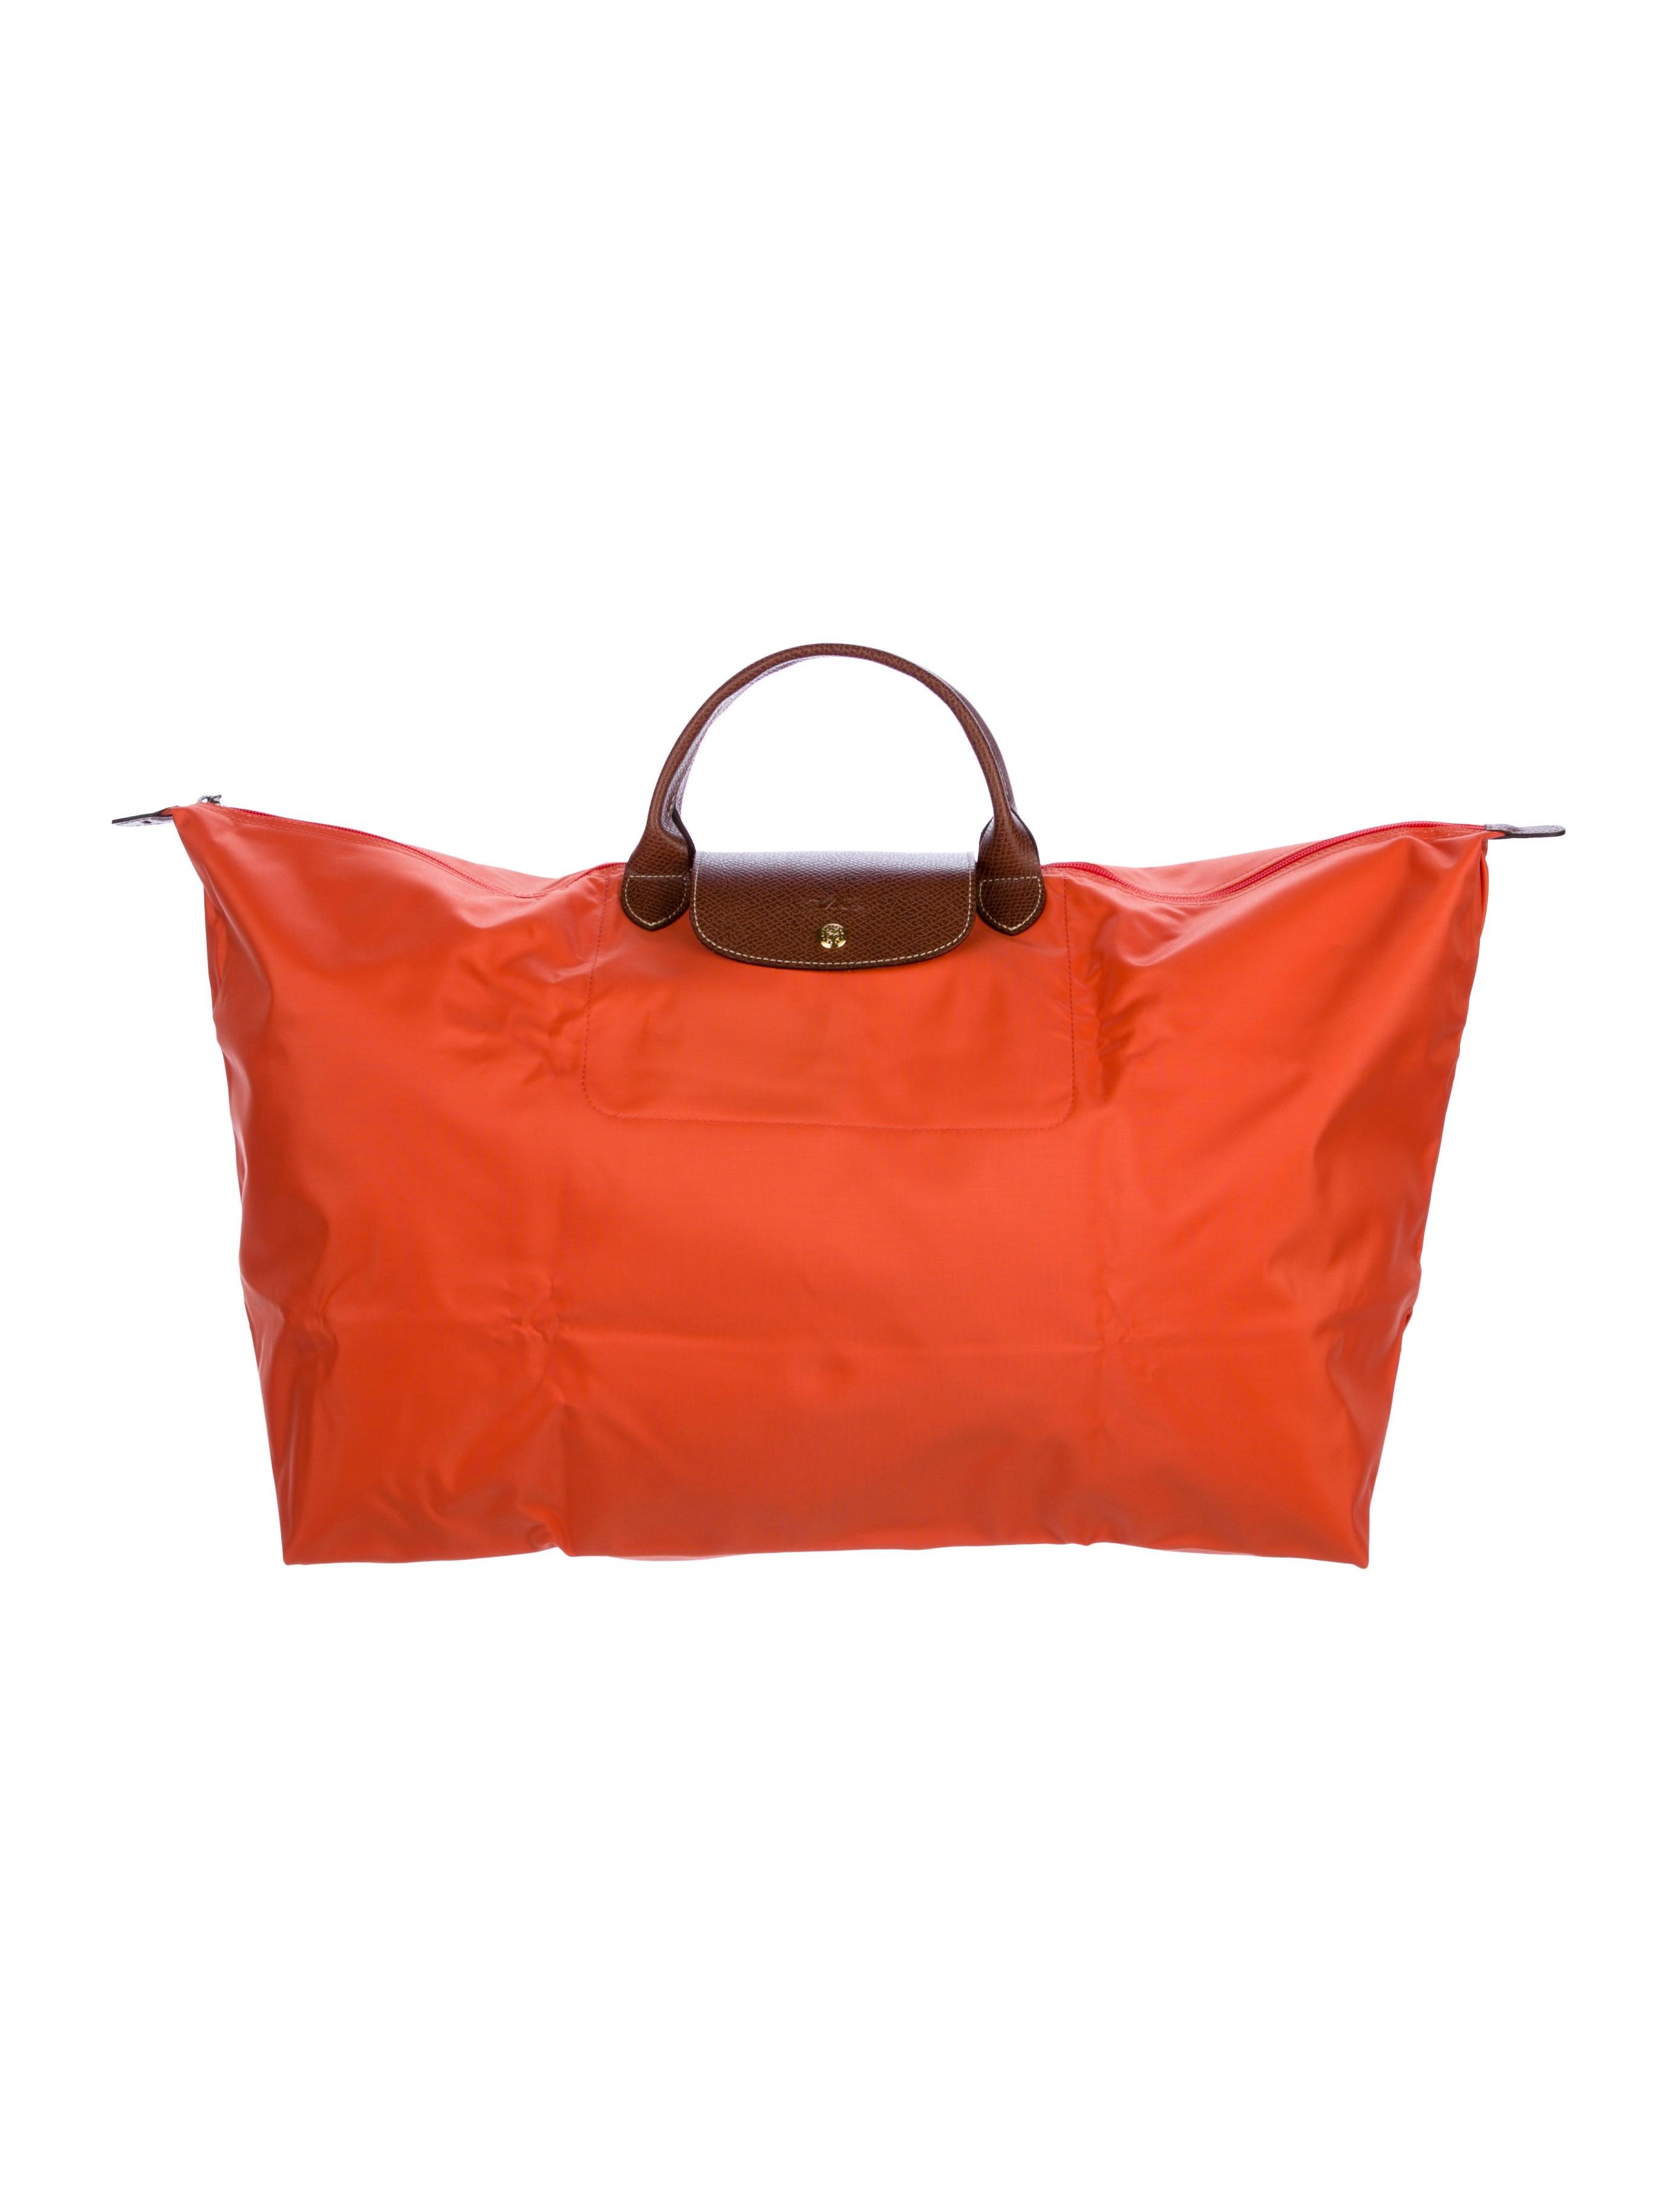 c1fac9ca5cd0 Longchamp Le Pliage Travel Bag Xl Price